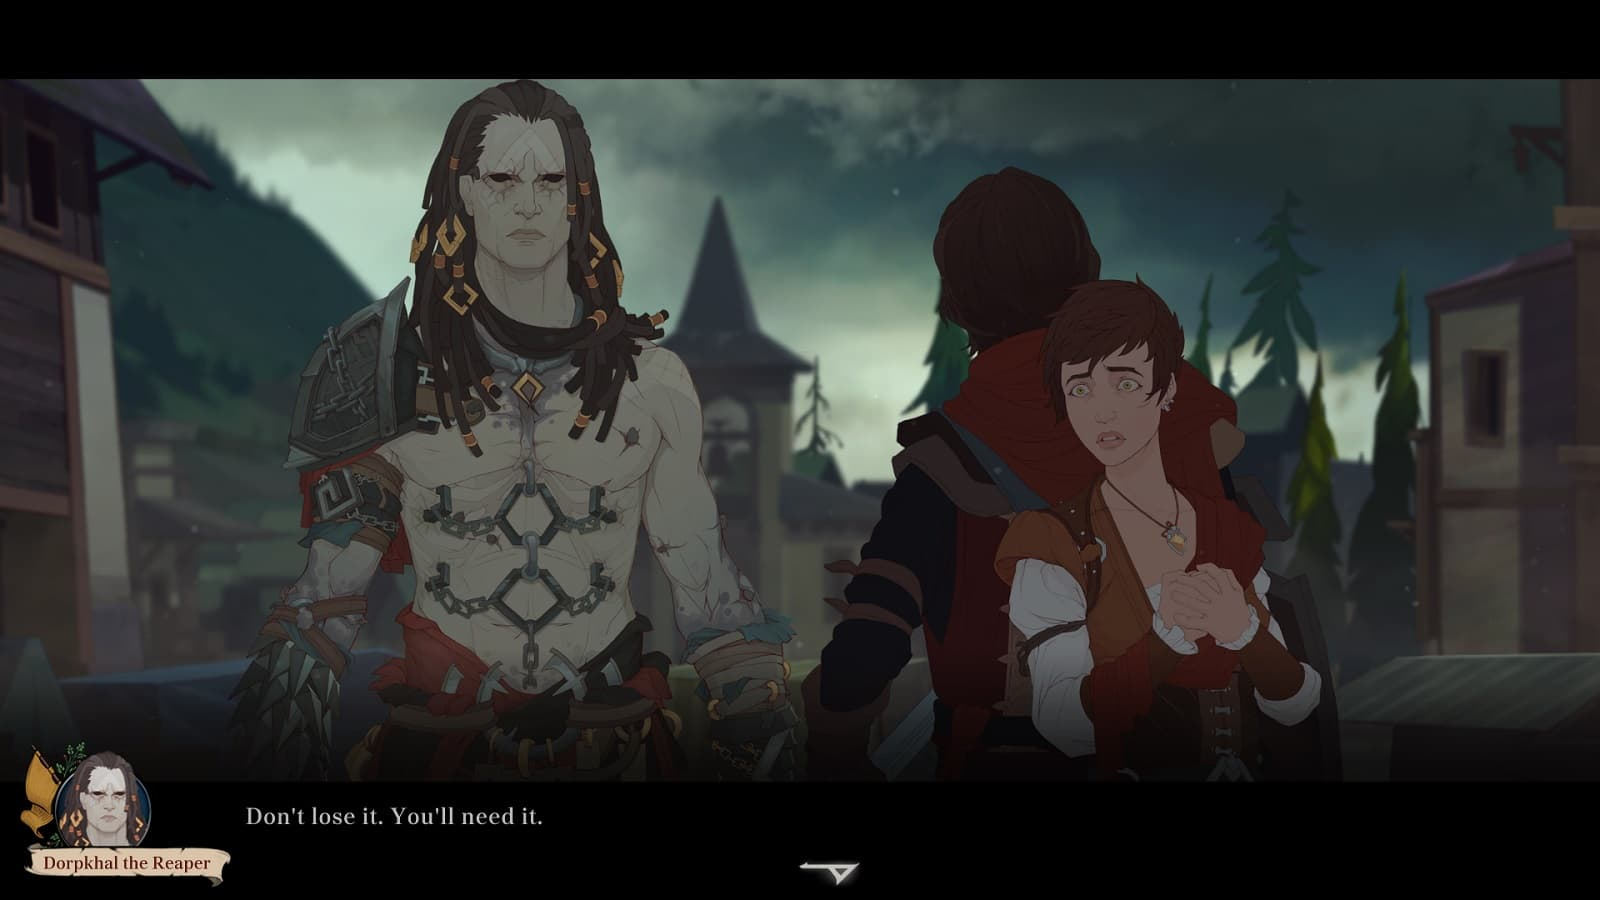 Ash of Gods Redemption, Ash of Gods, игра похожа на The Banner Saga, Фэнтези, Инди-игра, Рецензия, Обзор, Отзыв, Мнение, Fantasy, Indie Game, Review